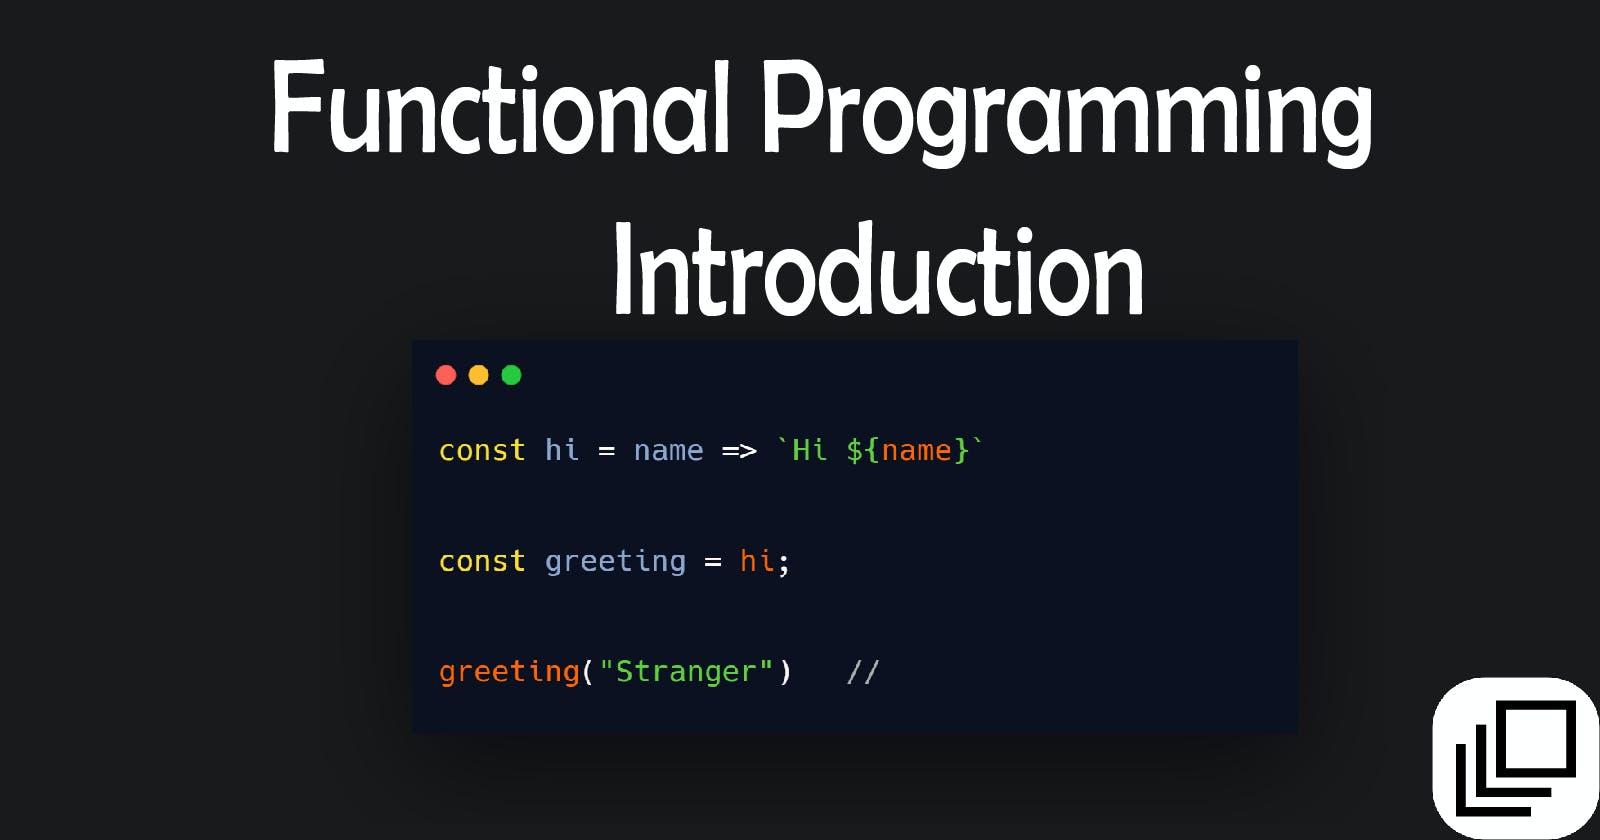 Functional Programming : Functions